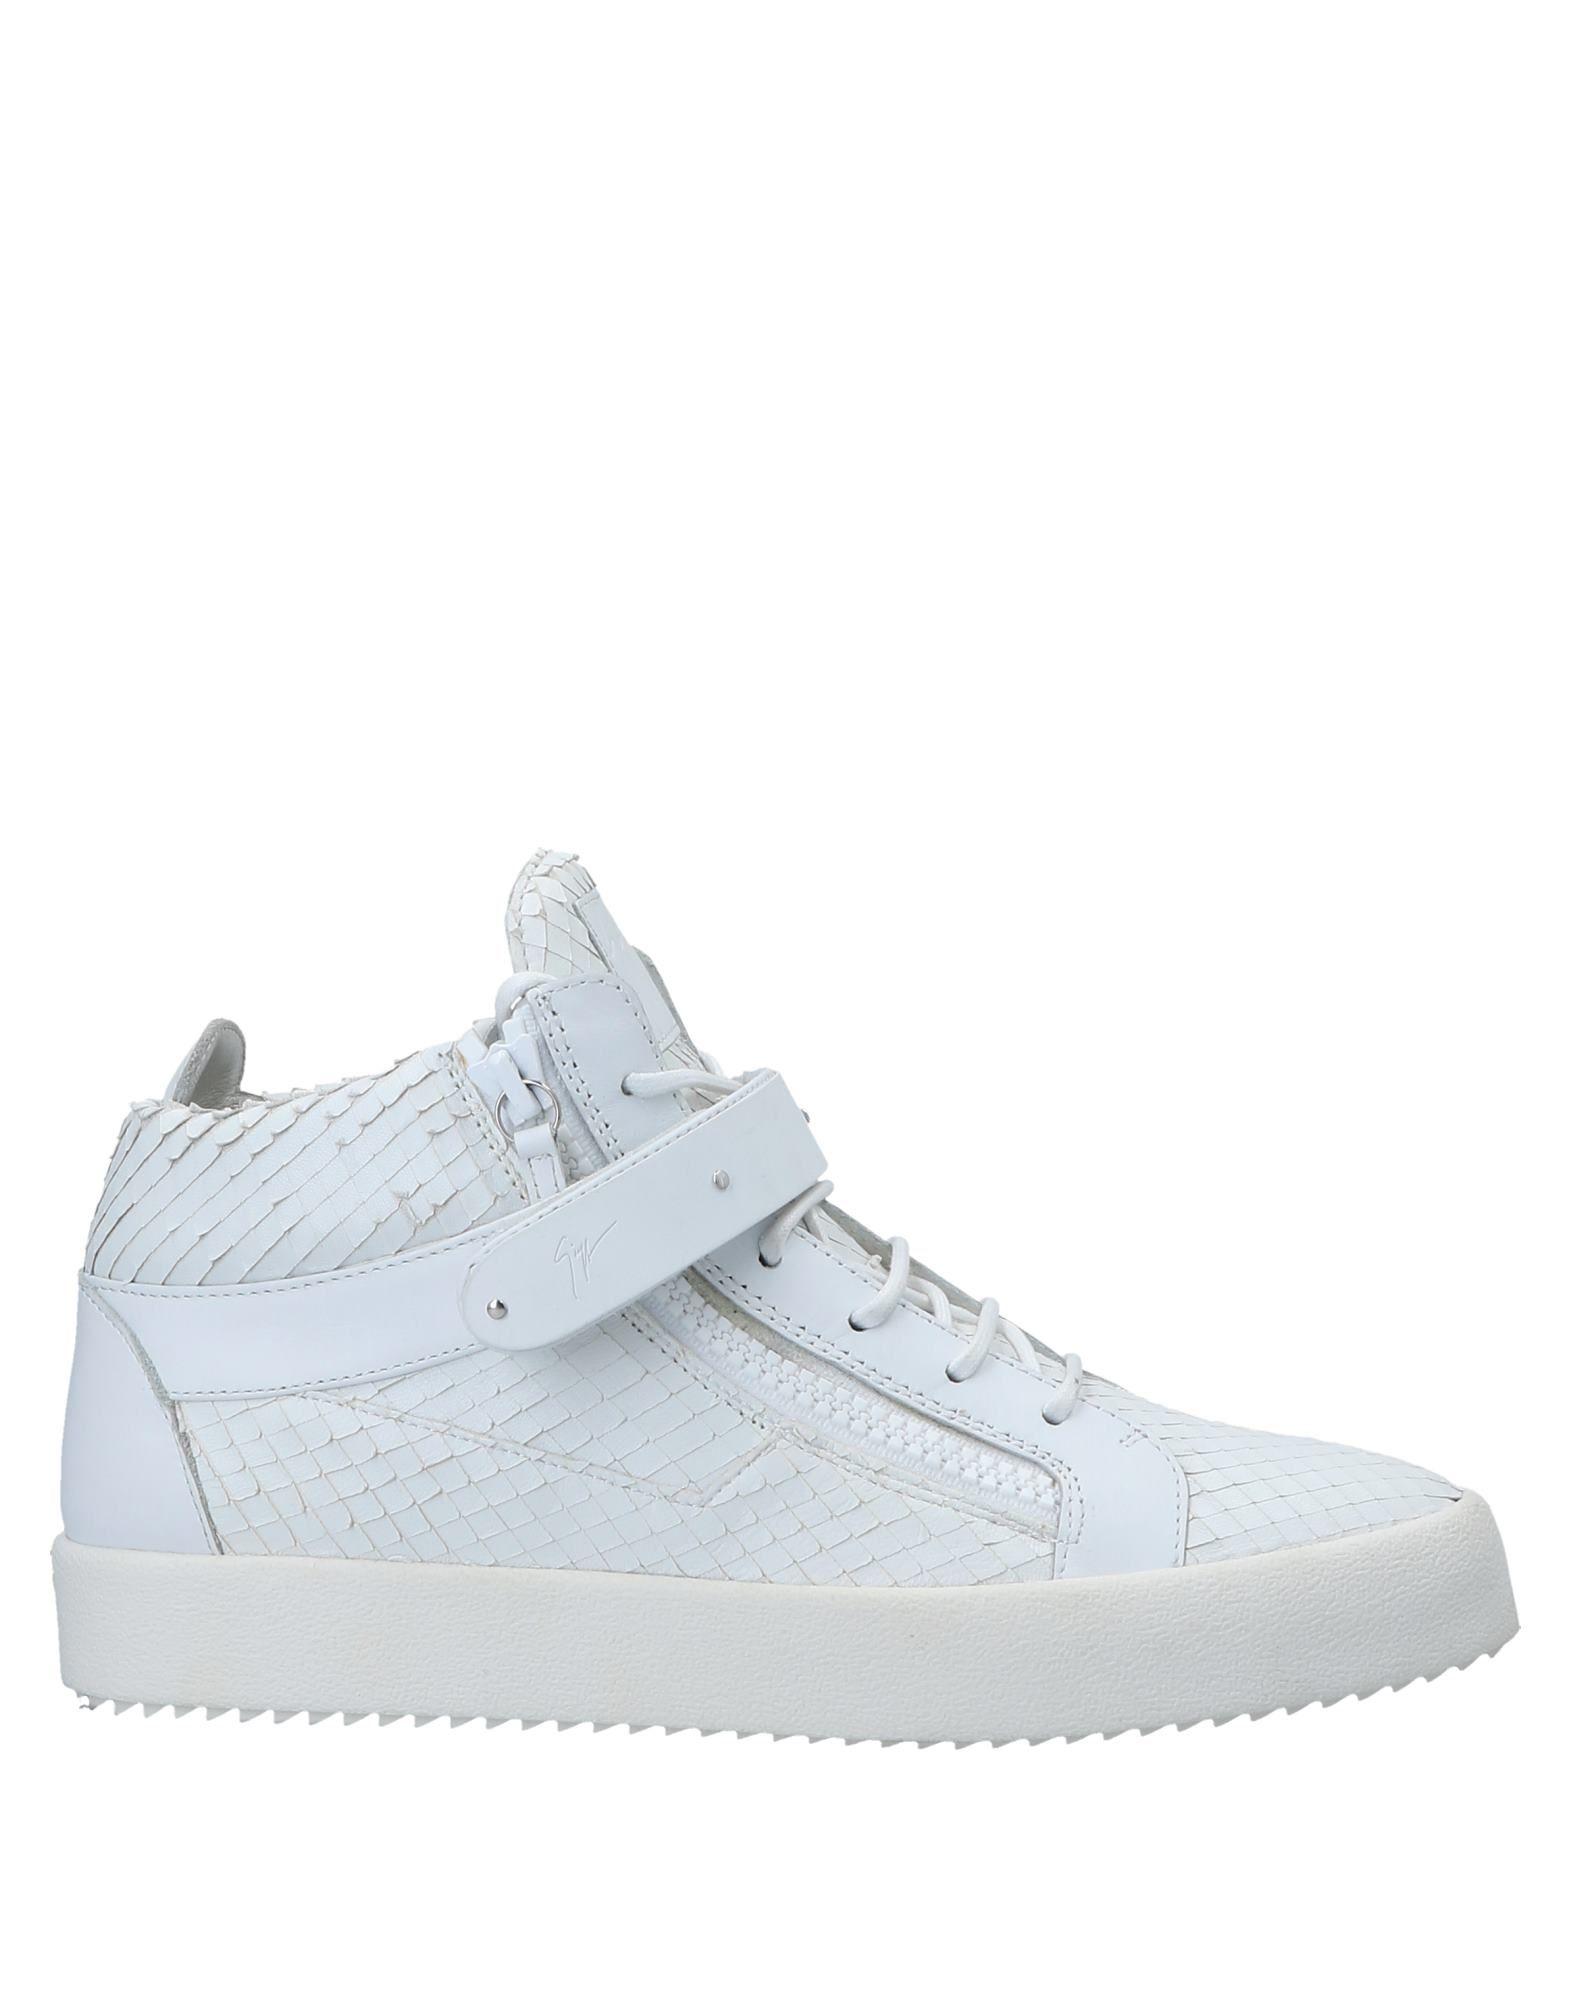 Sneakers Giuseppe Zanotti Homme - Sneakers Giuseppe Zanotti  Blanc Réduction de prix saisonnier, remise